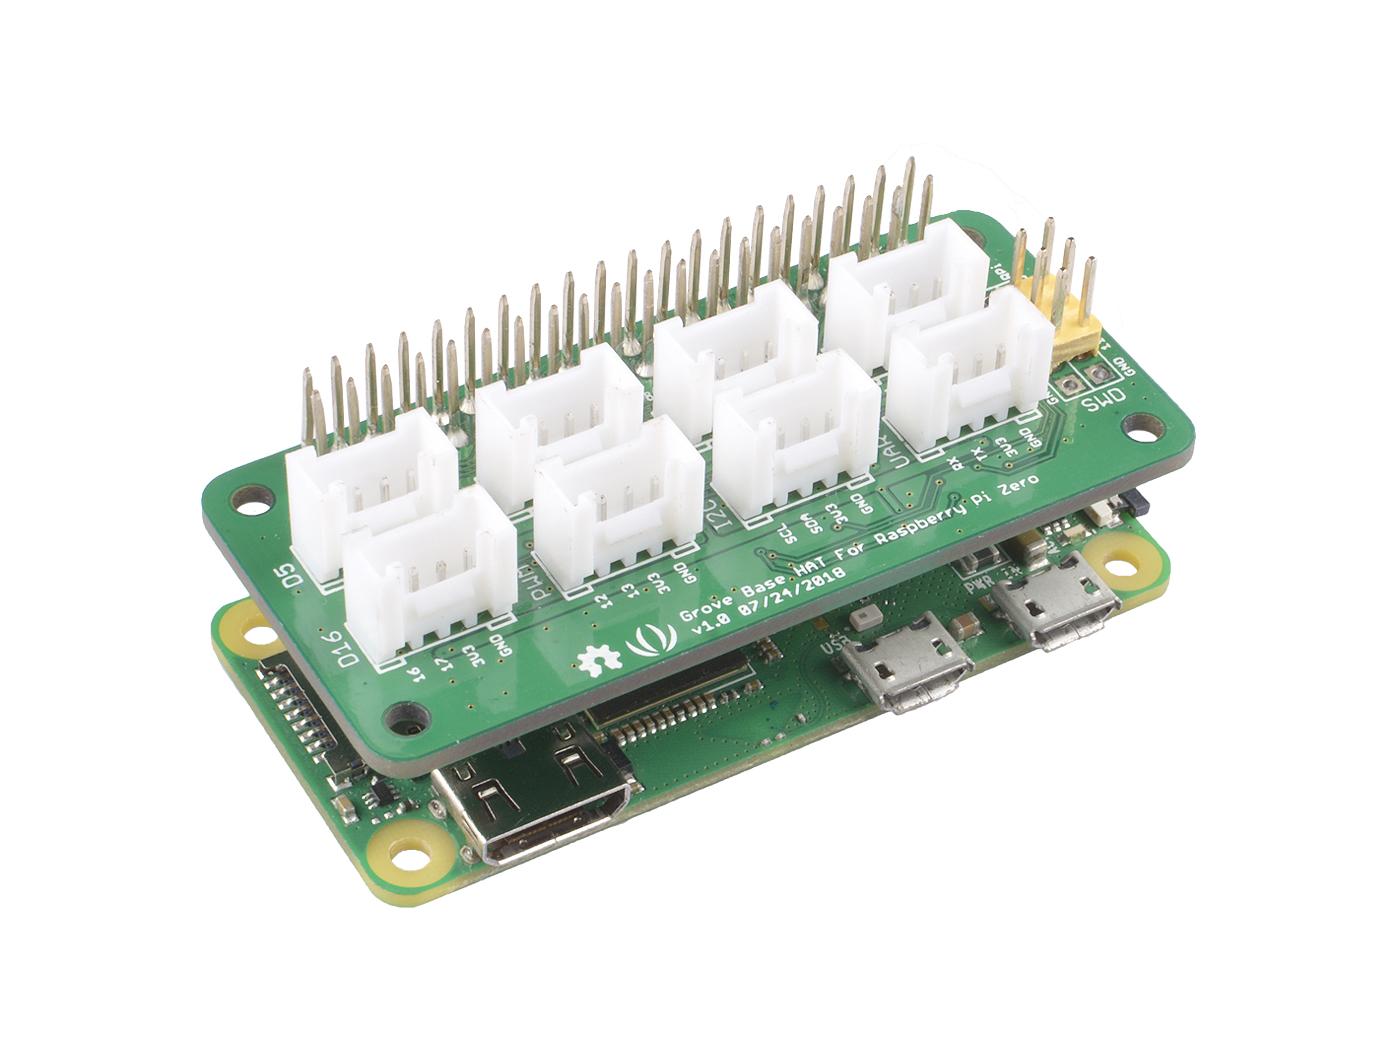 Grove Base Hat for Raspberry Pi Zero